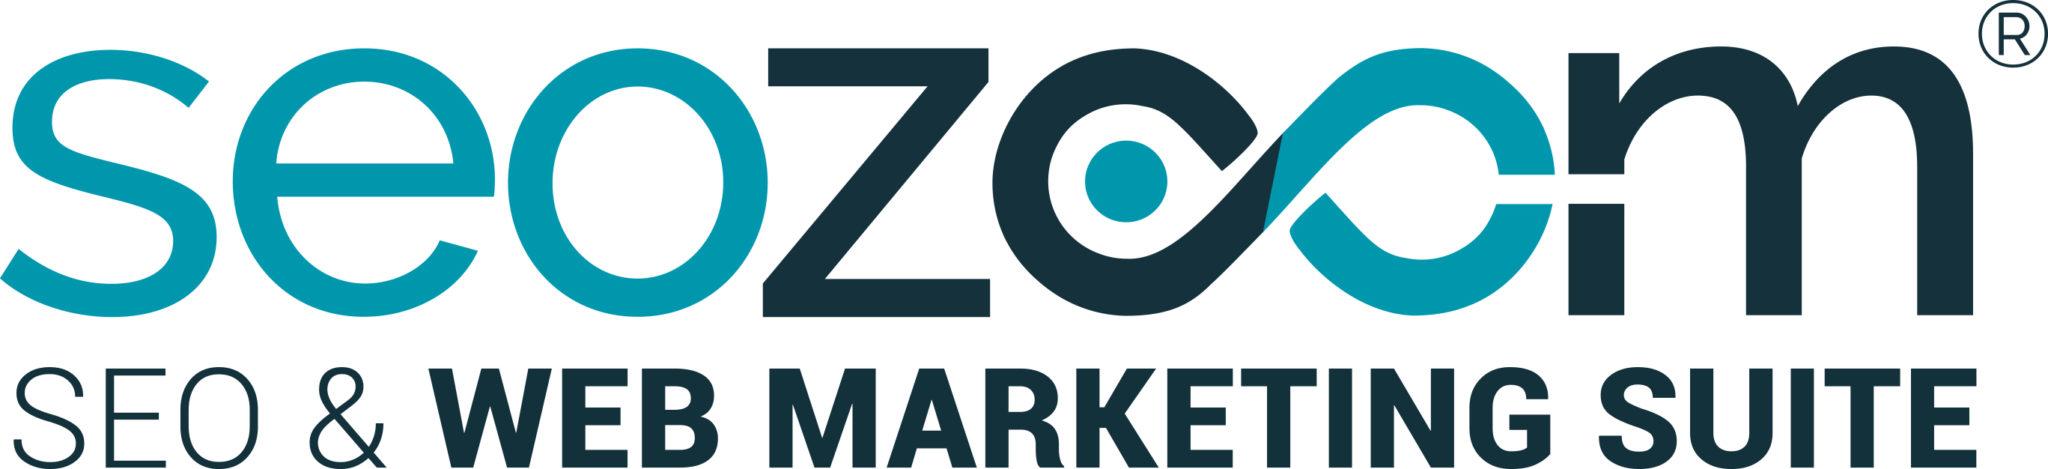 Logo SeooZomm suite seo tool